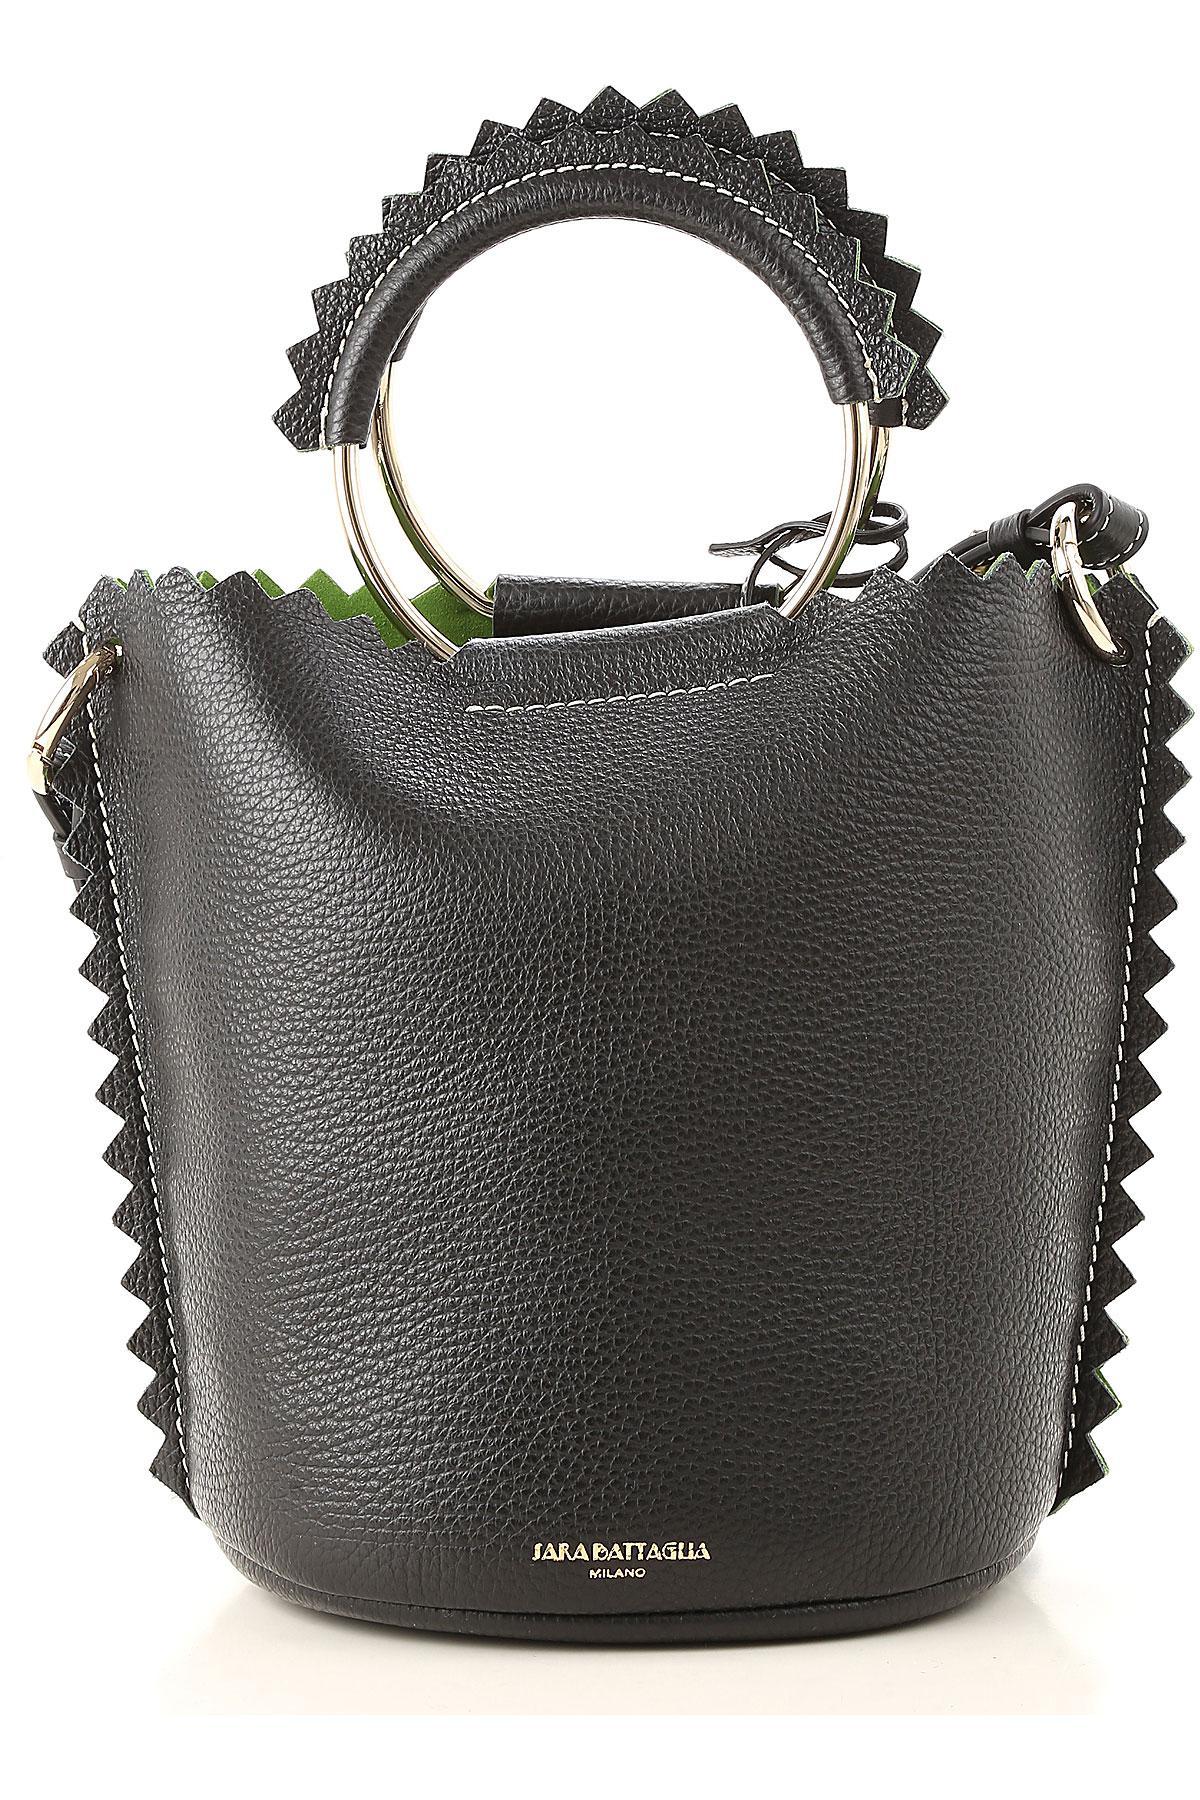 7a8c443c2d9 Lyst - Sara Battaglia Shoulder Bag For Women in Black